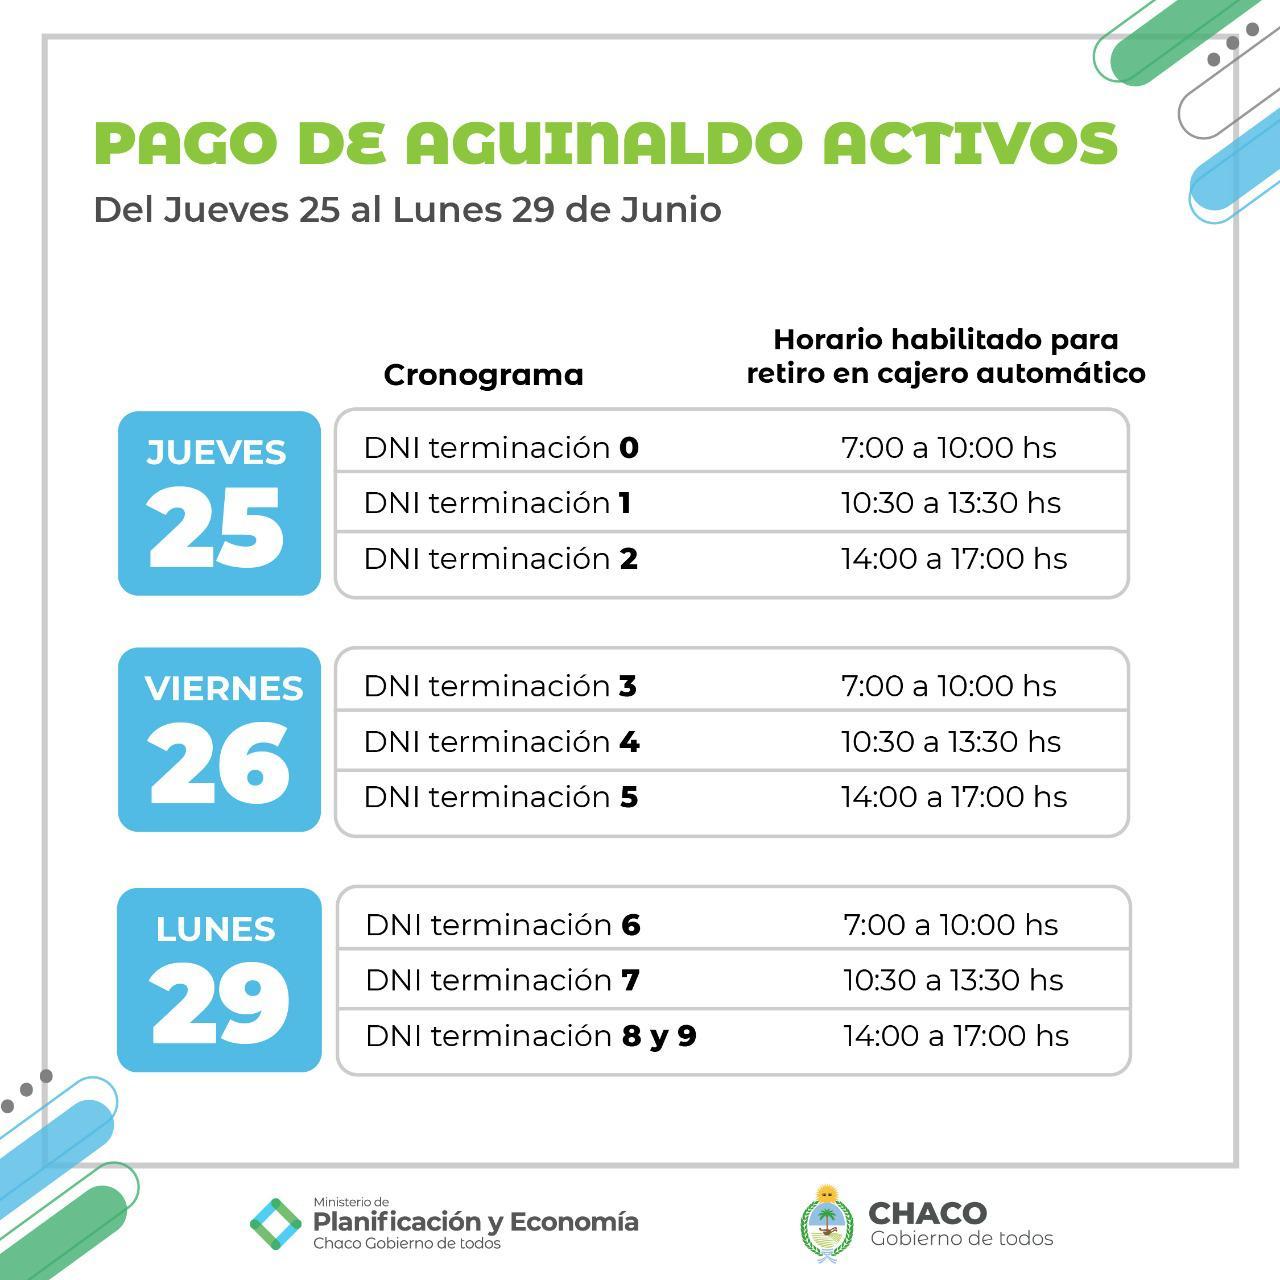 Aguinaldo-Activos-20-06-17-01